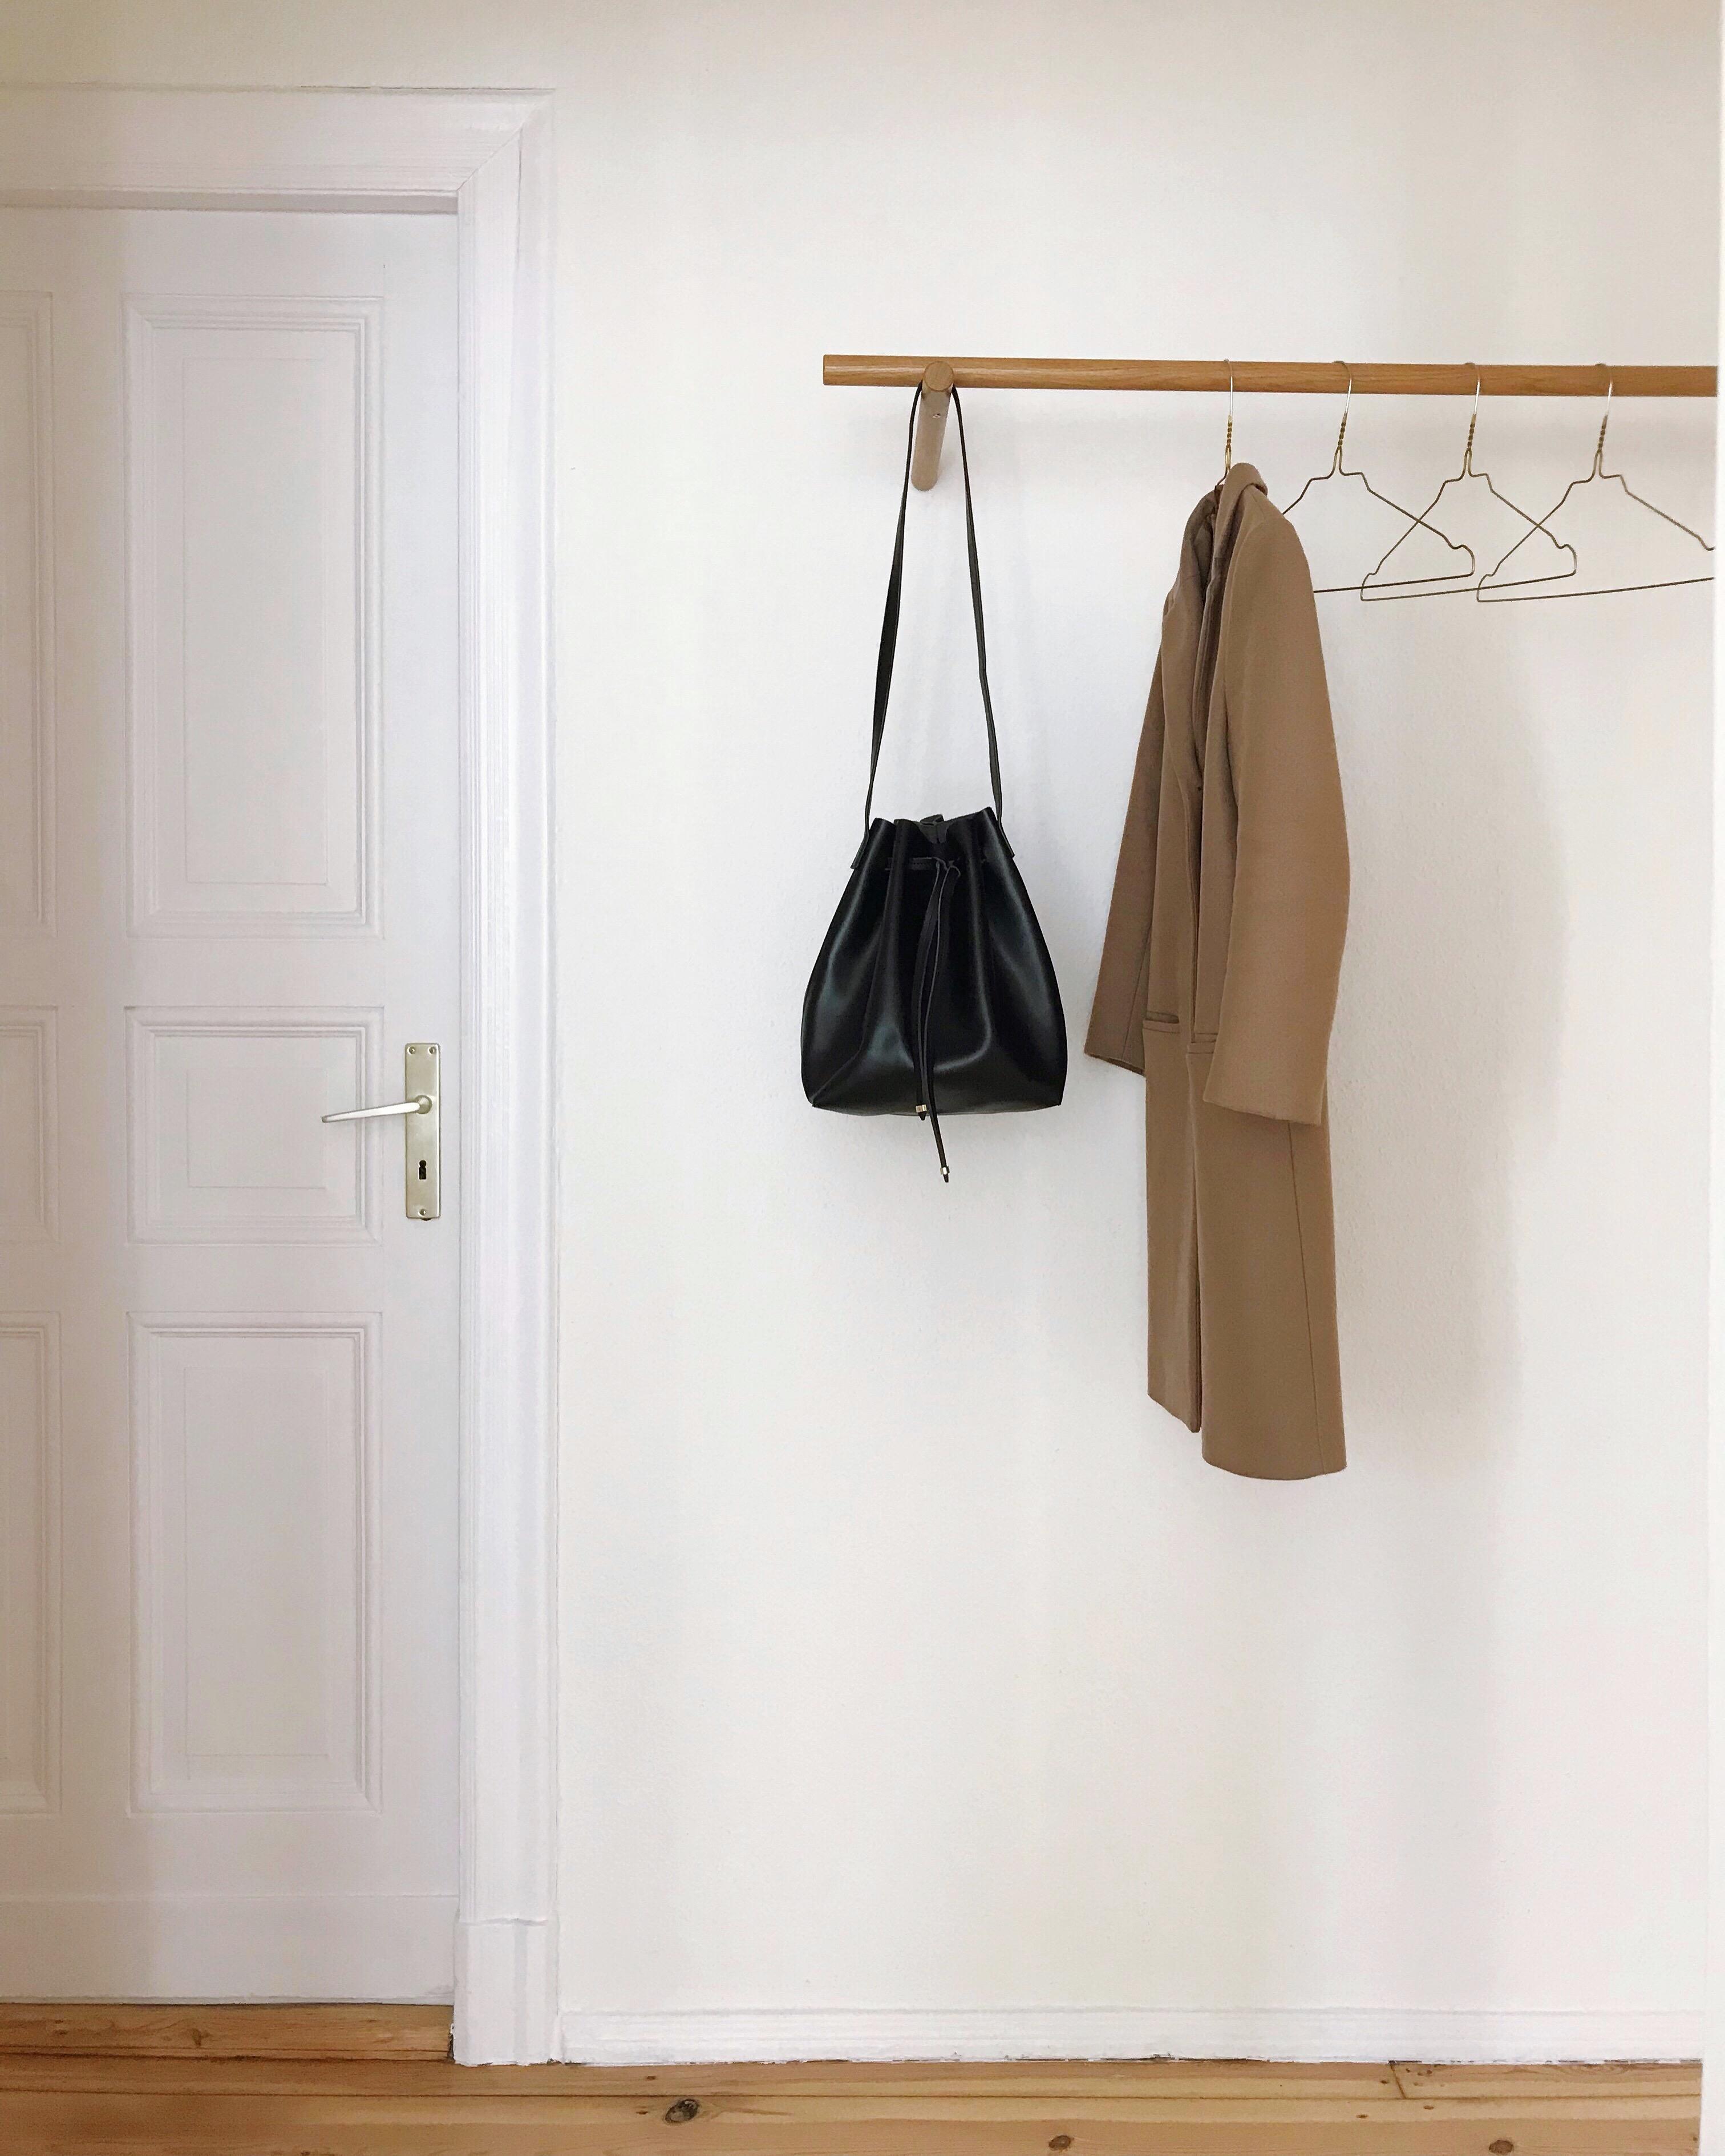 garderobe selbst gemacht garderobe selber machen ideen affordable trendy f r den with garderobe. Black Bedroom Furniture Sets. Home Design Ideas